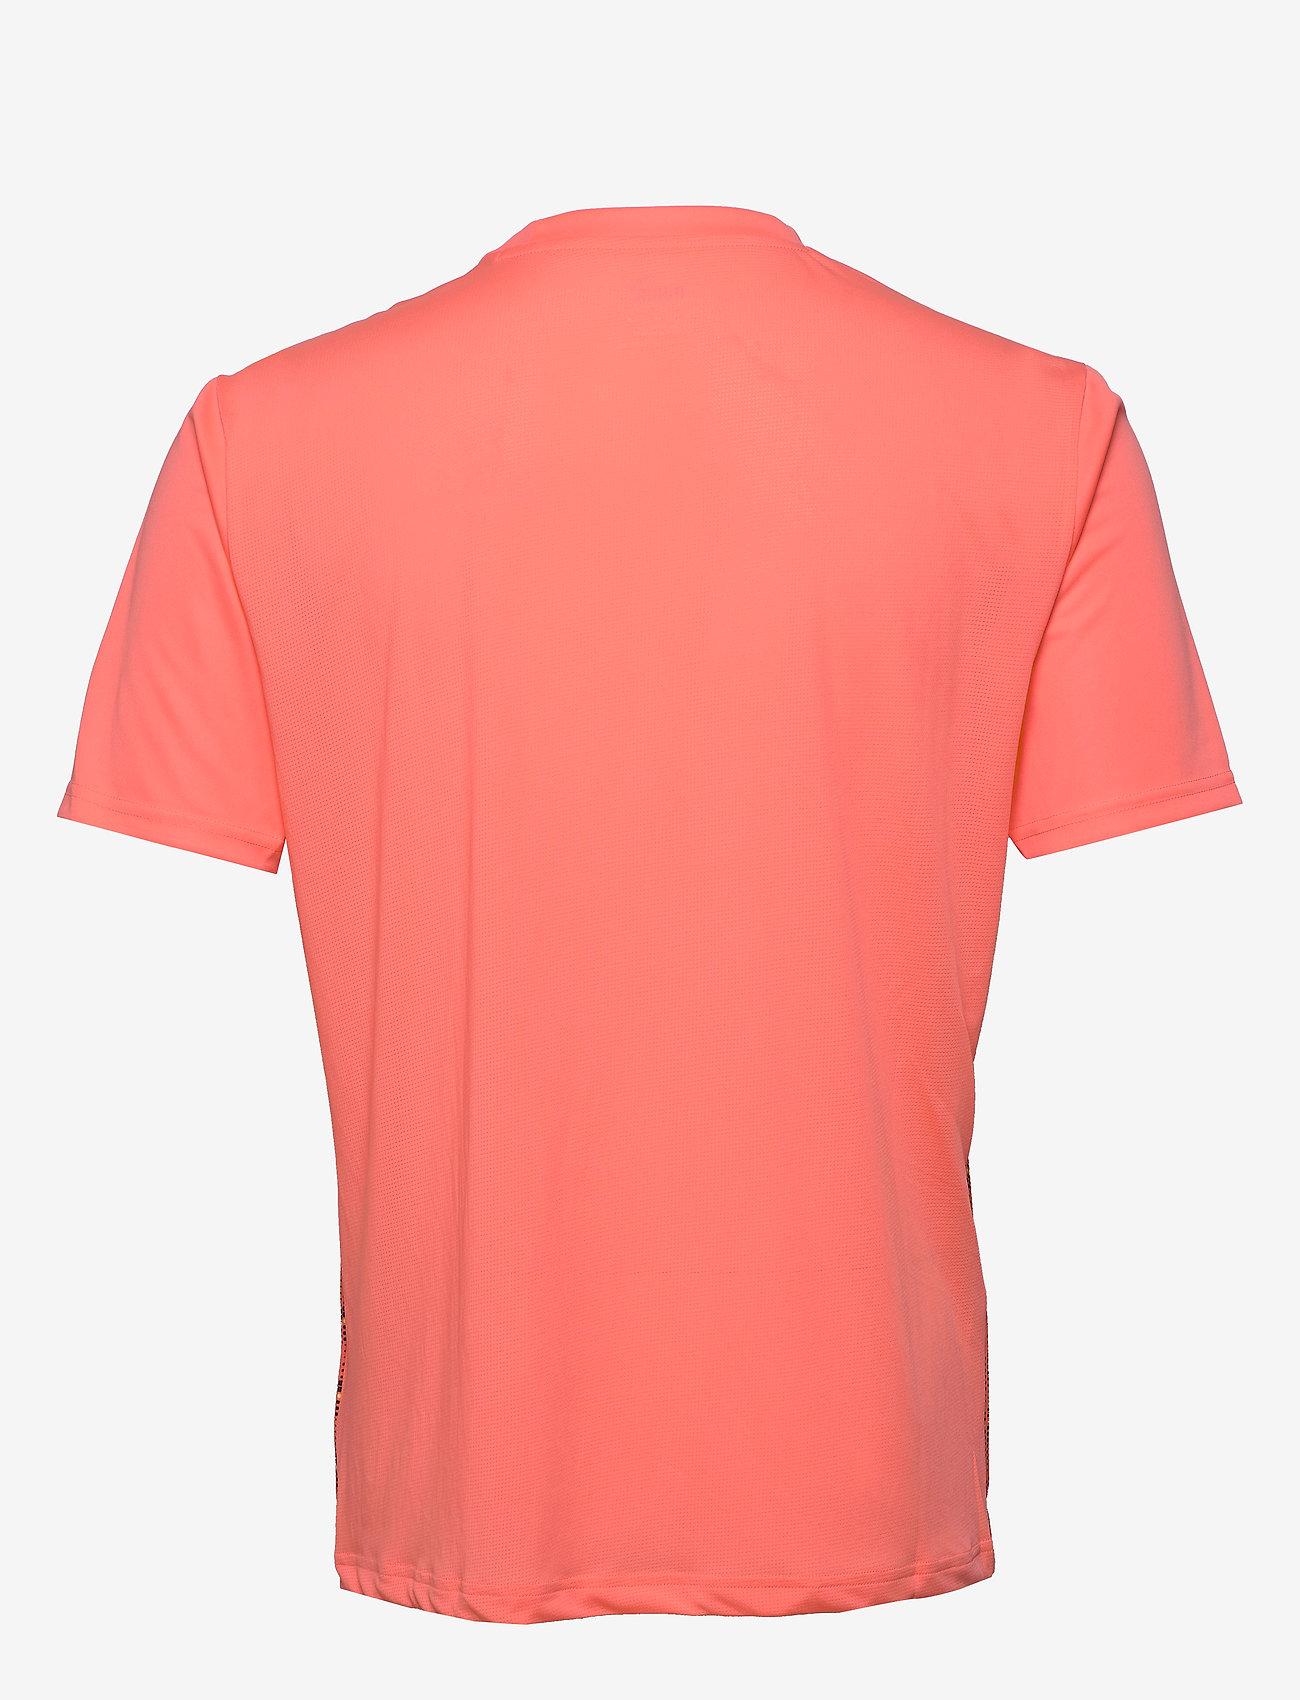 PUMA - ftblNXT Graphic Shirt Core - football shirts - nrgy peach-fizzy yellow - 1